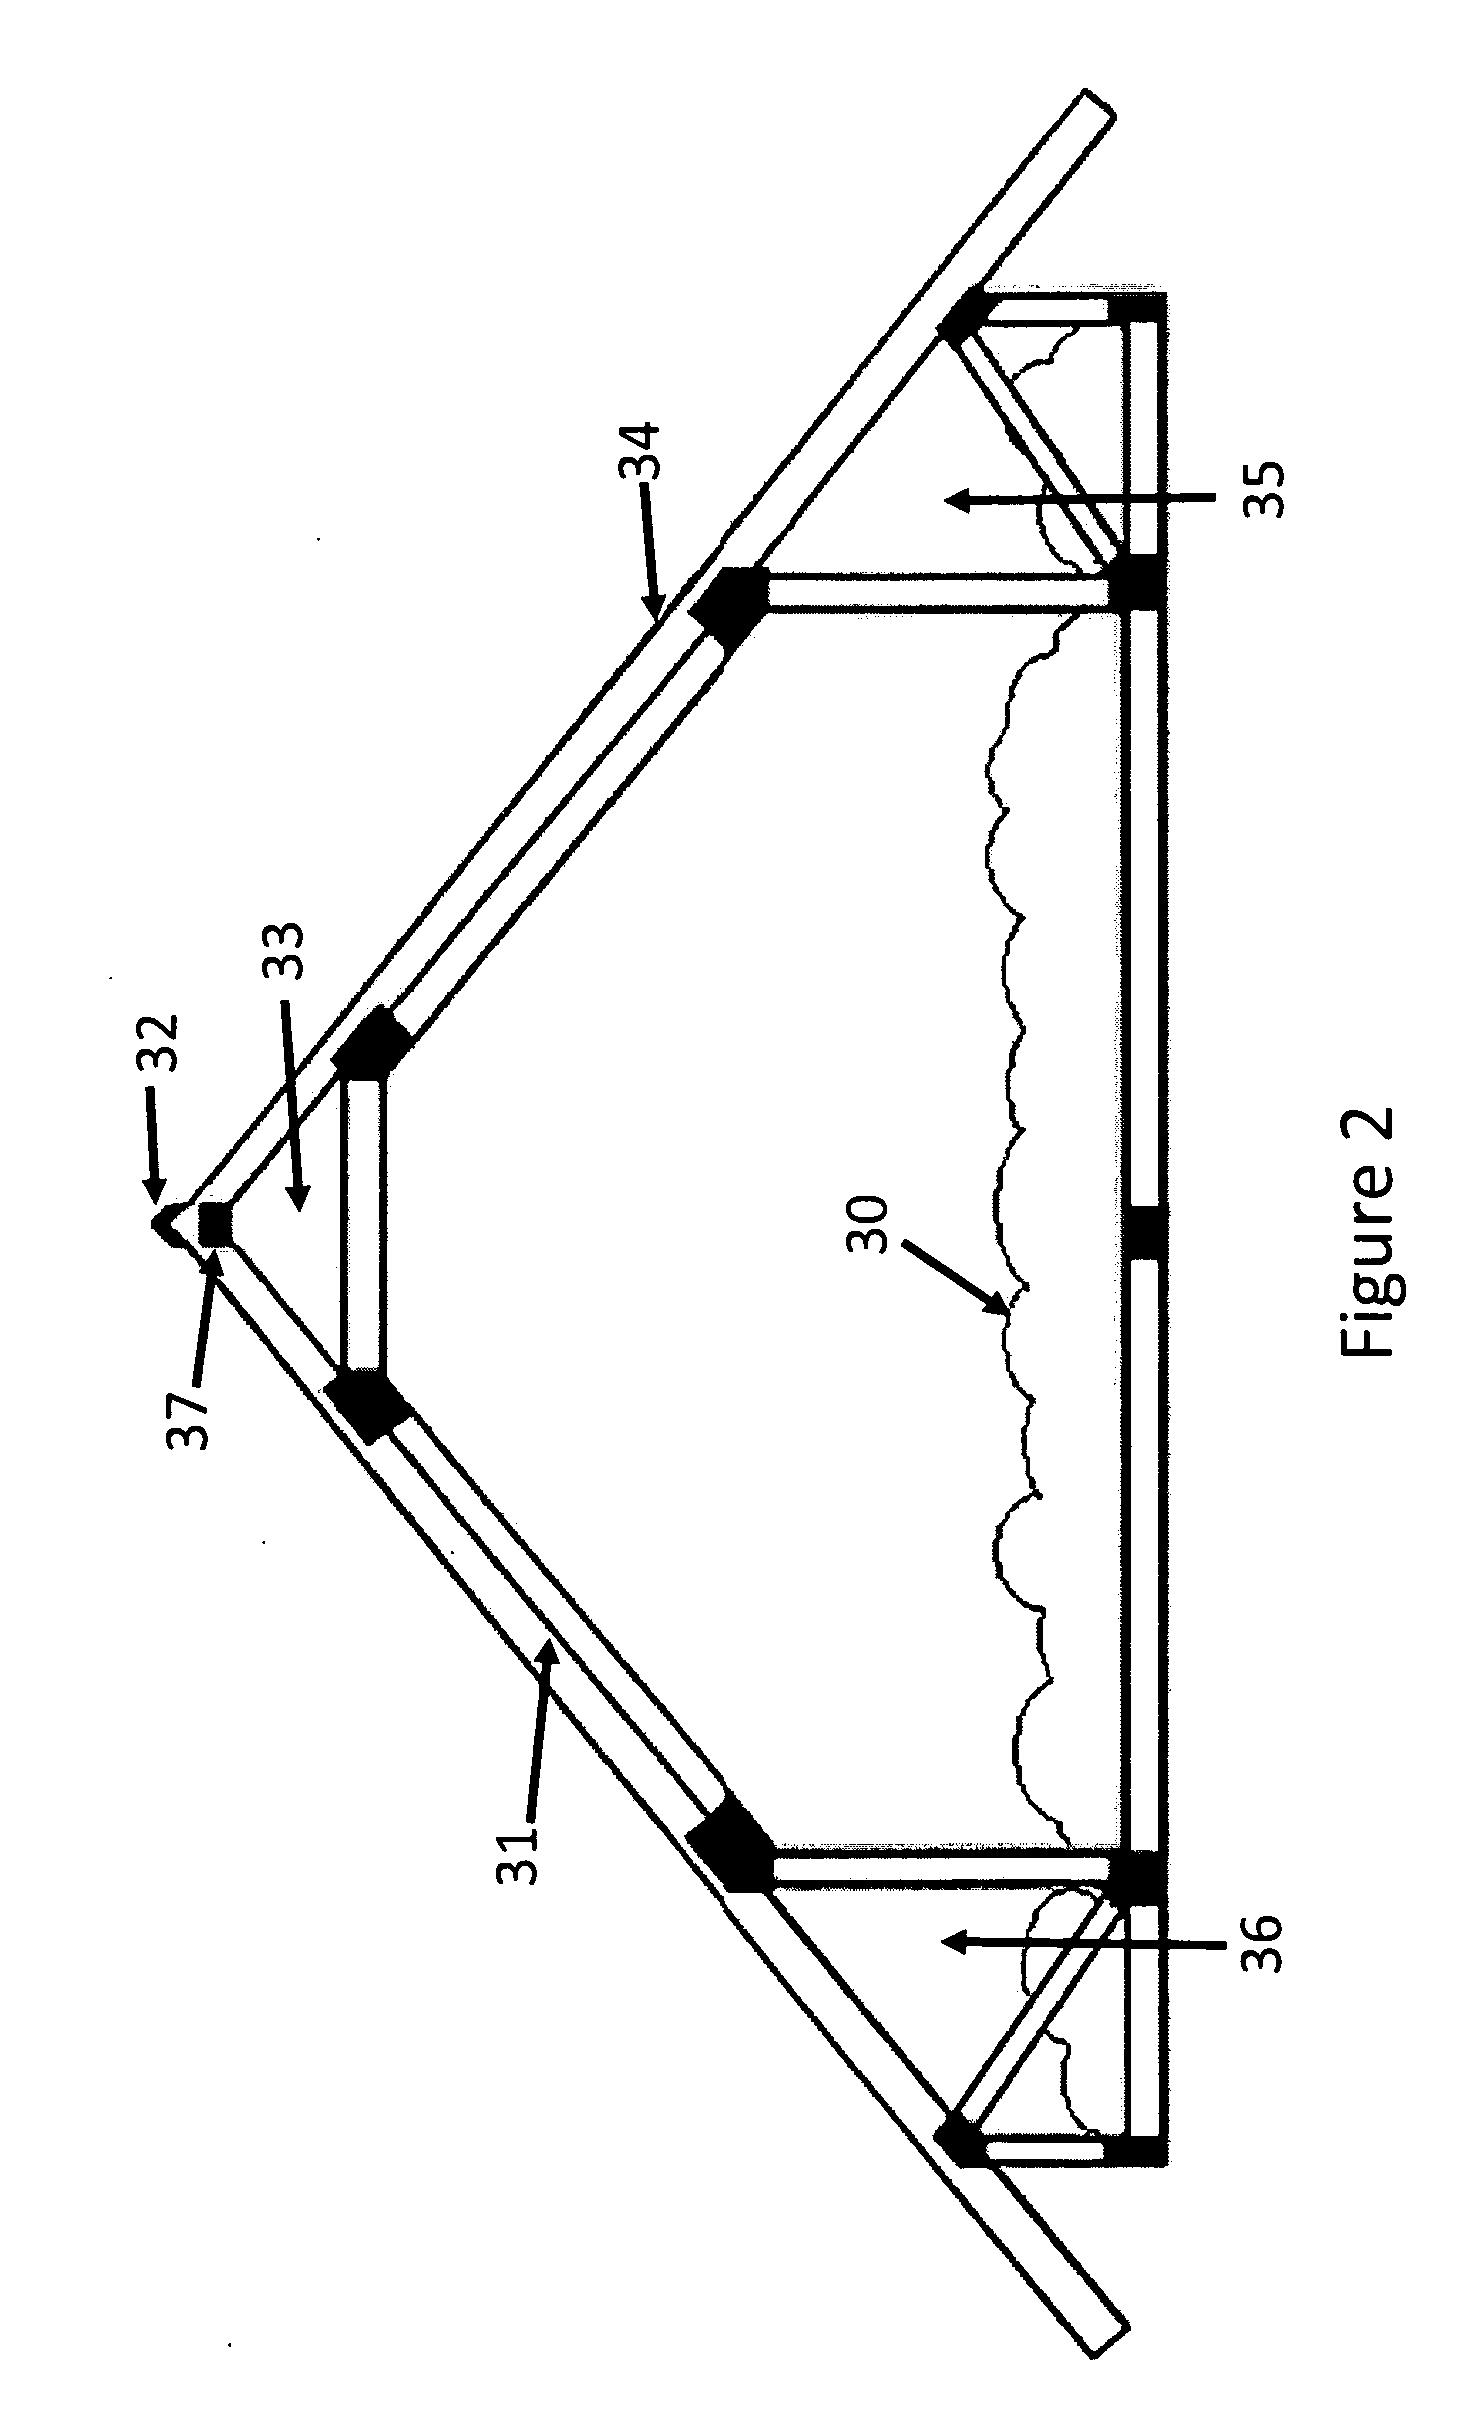 Suzuki Sidekick Parts Diagram Manifold. Suzuki. Auto